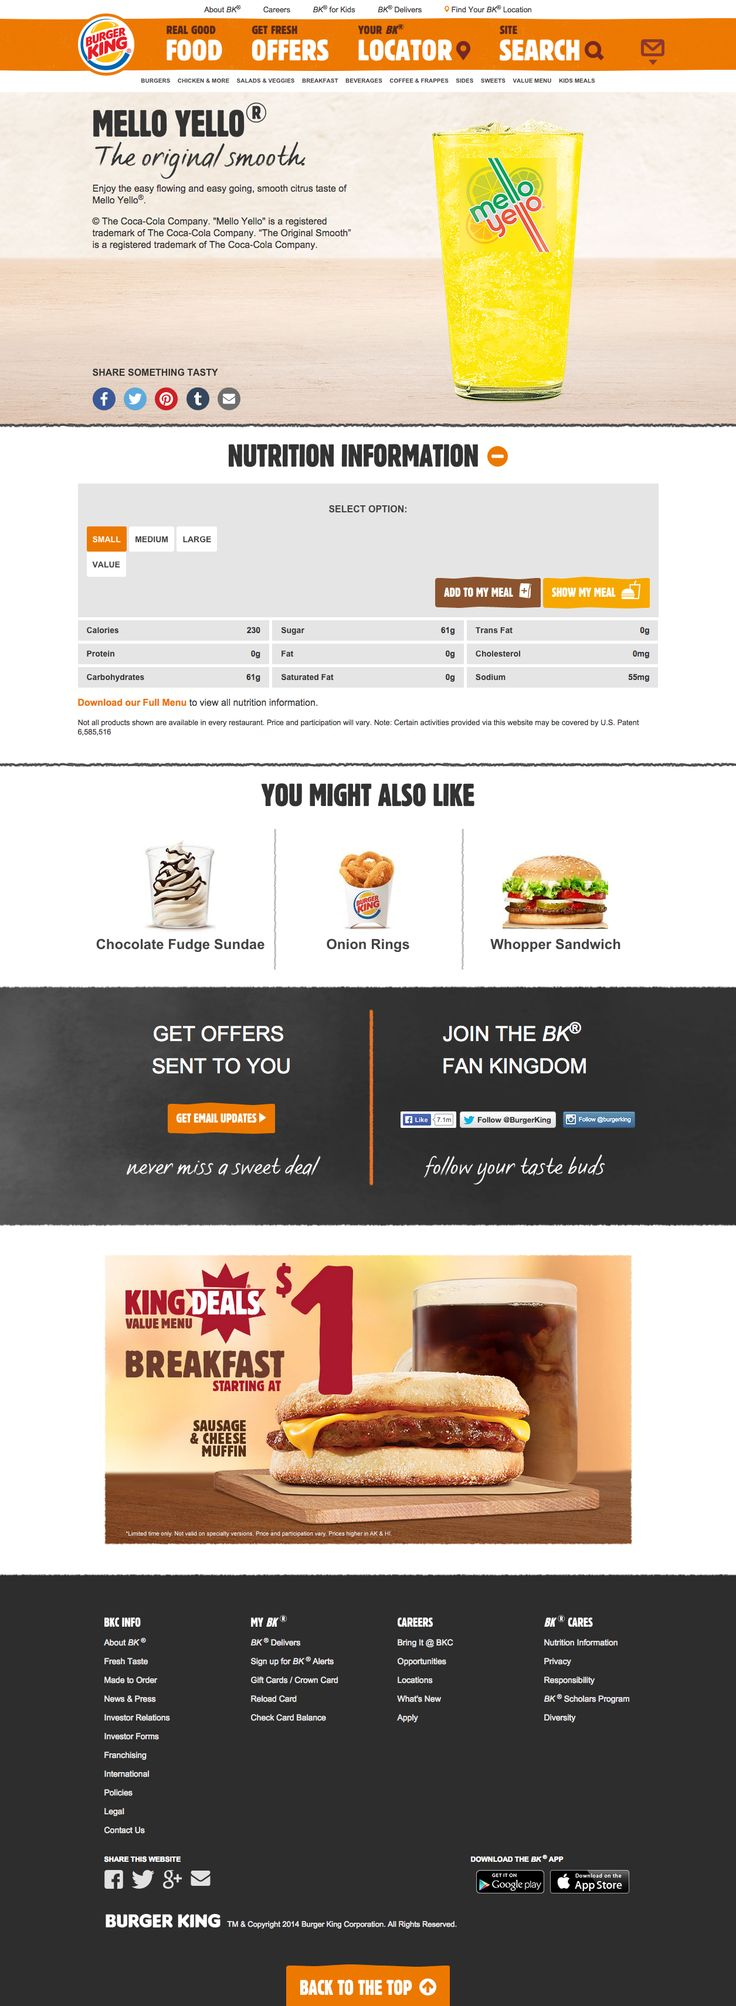 bk.com - Nutrition information